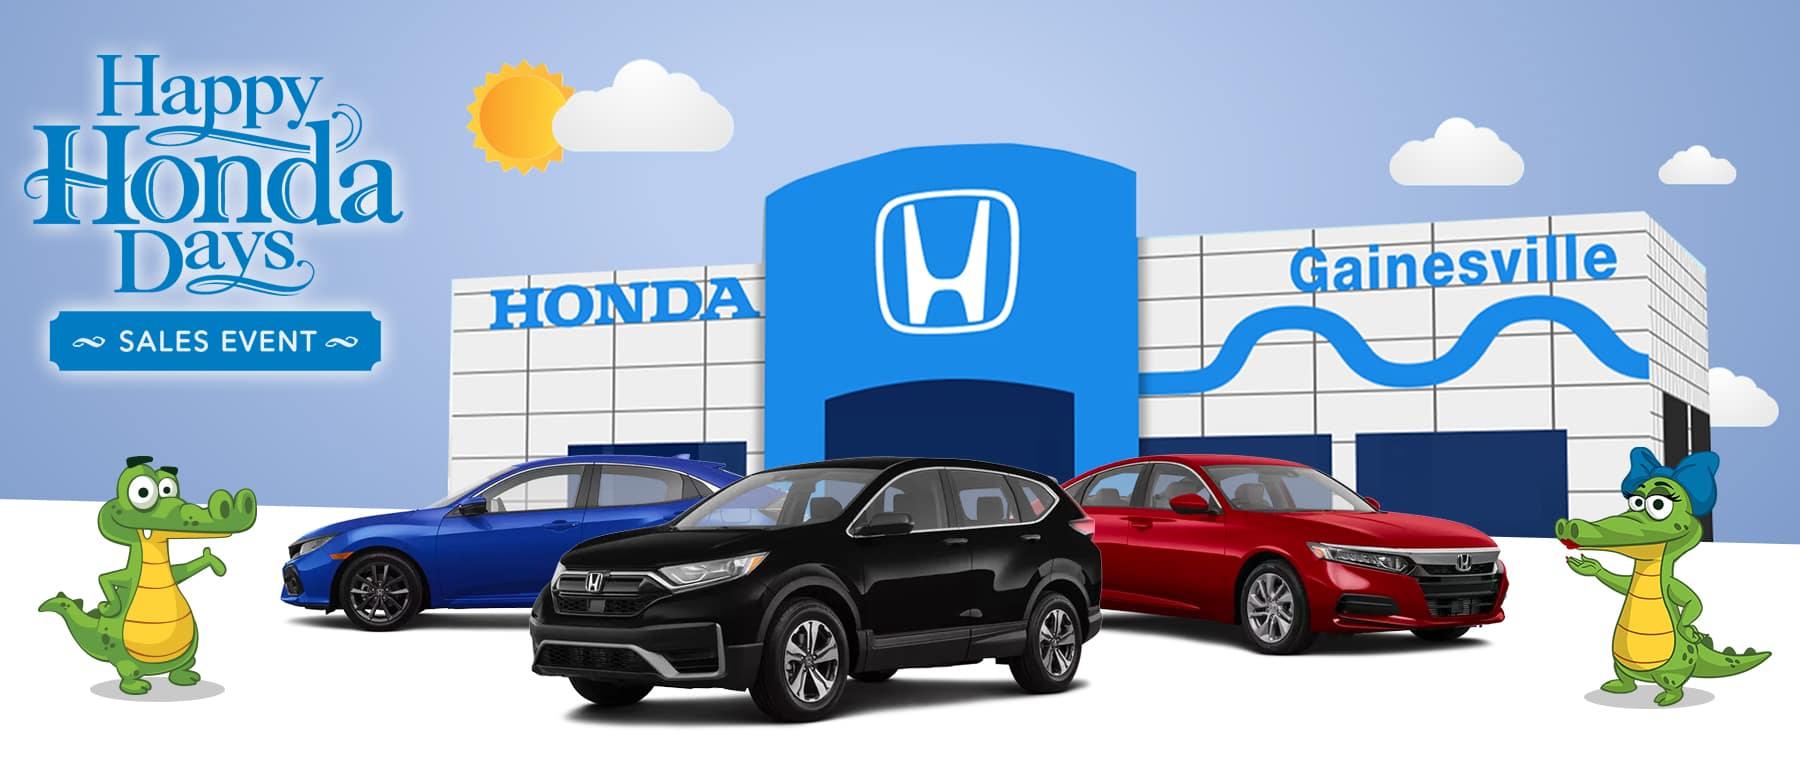 Happy Honda Days Sales Event